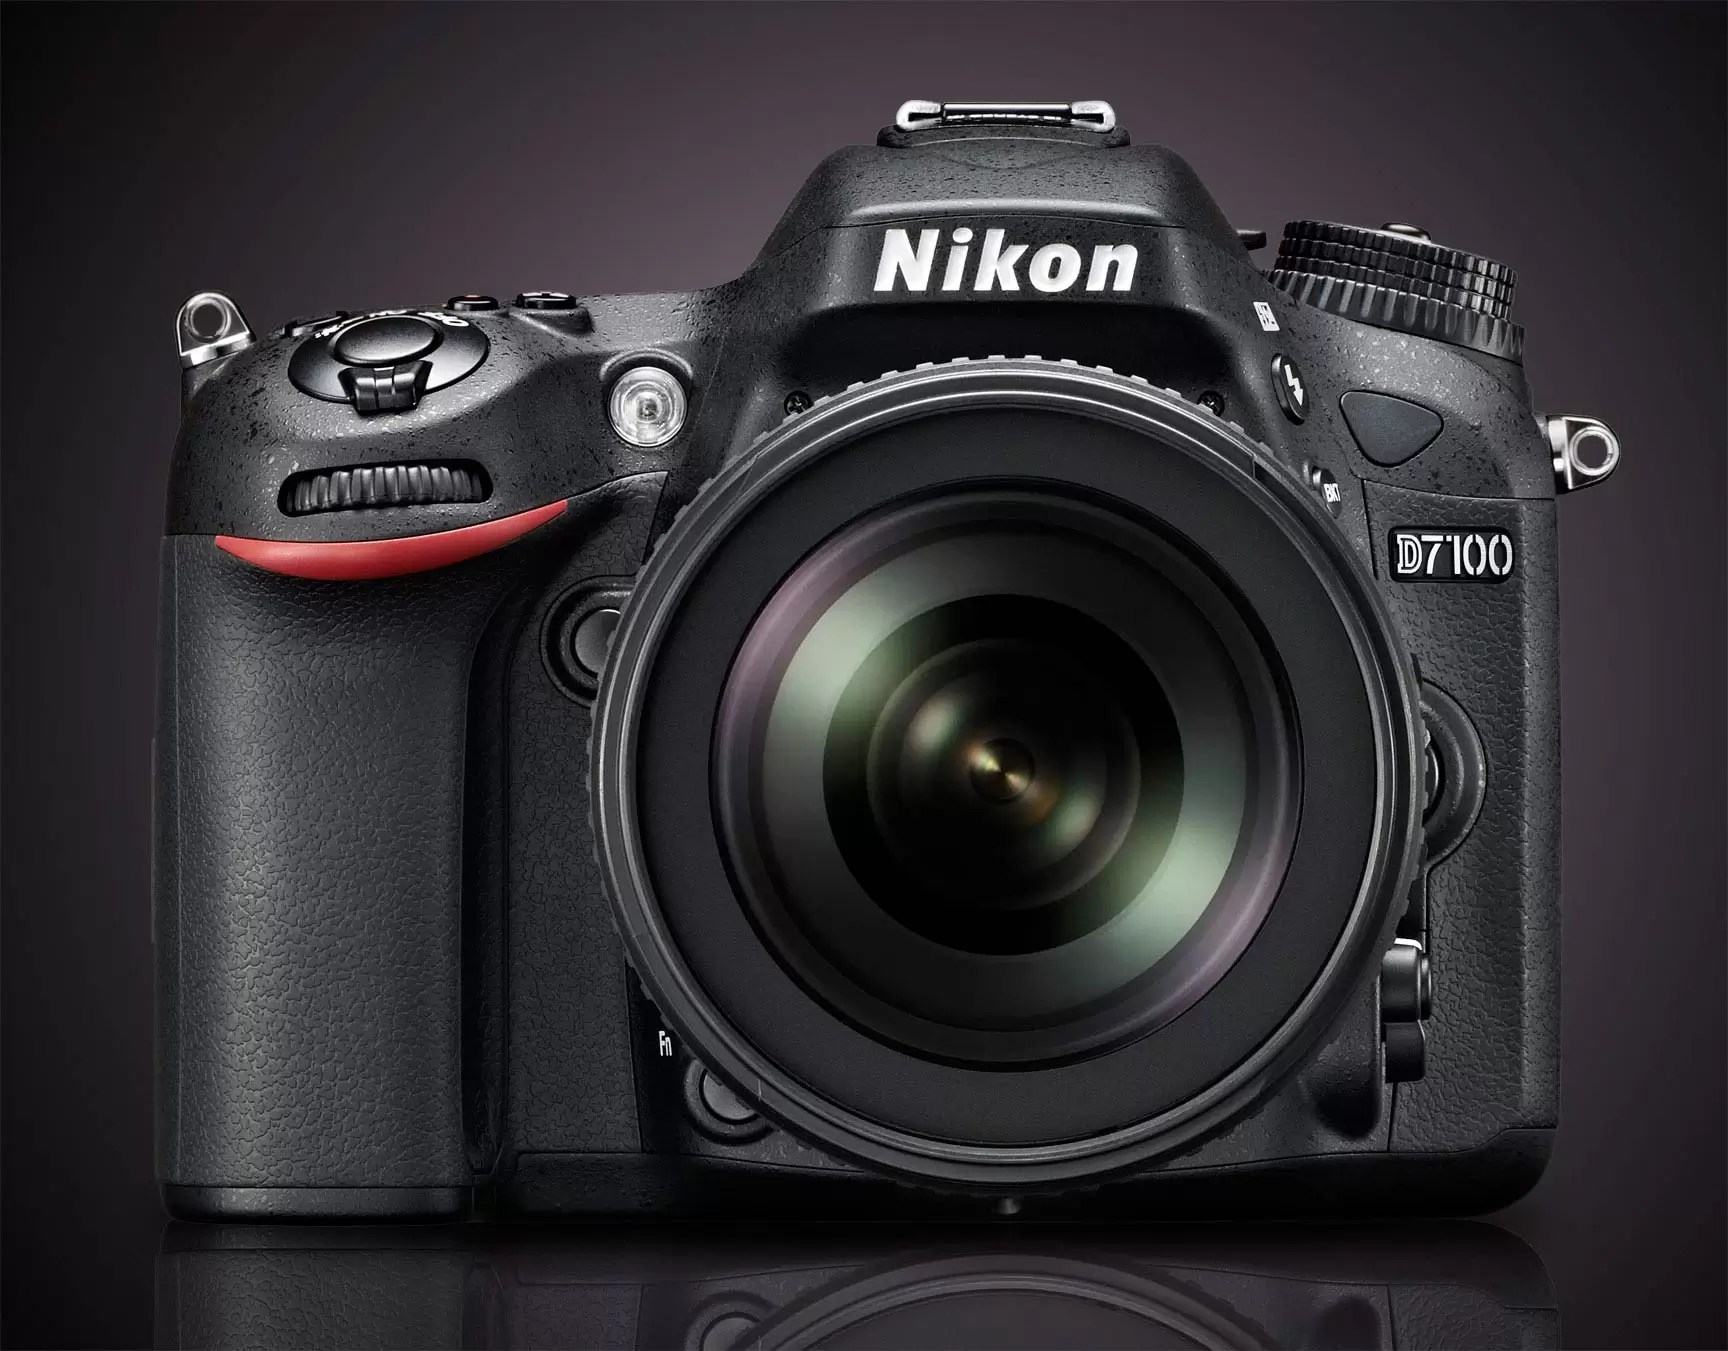 Nikon D7100 Wedding Photography: Nikon D7100, 24.1 Megapixel SLR Without AA Filter